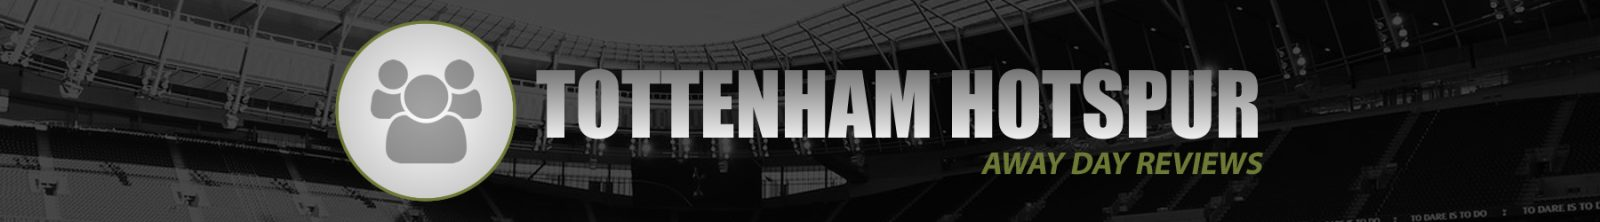 Review Tottenham Hotspur